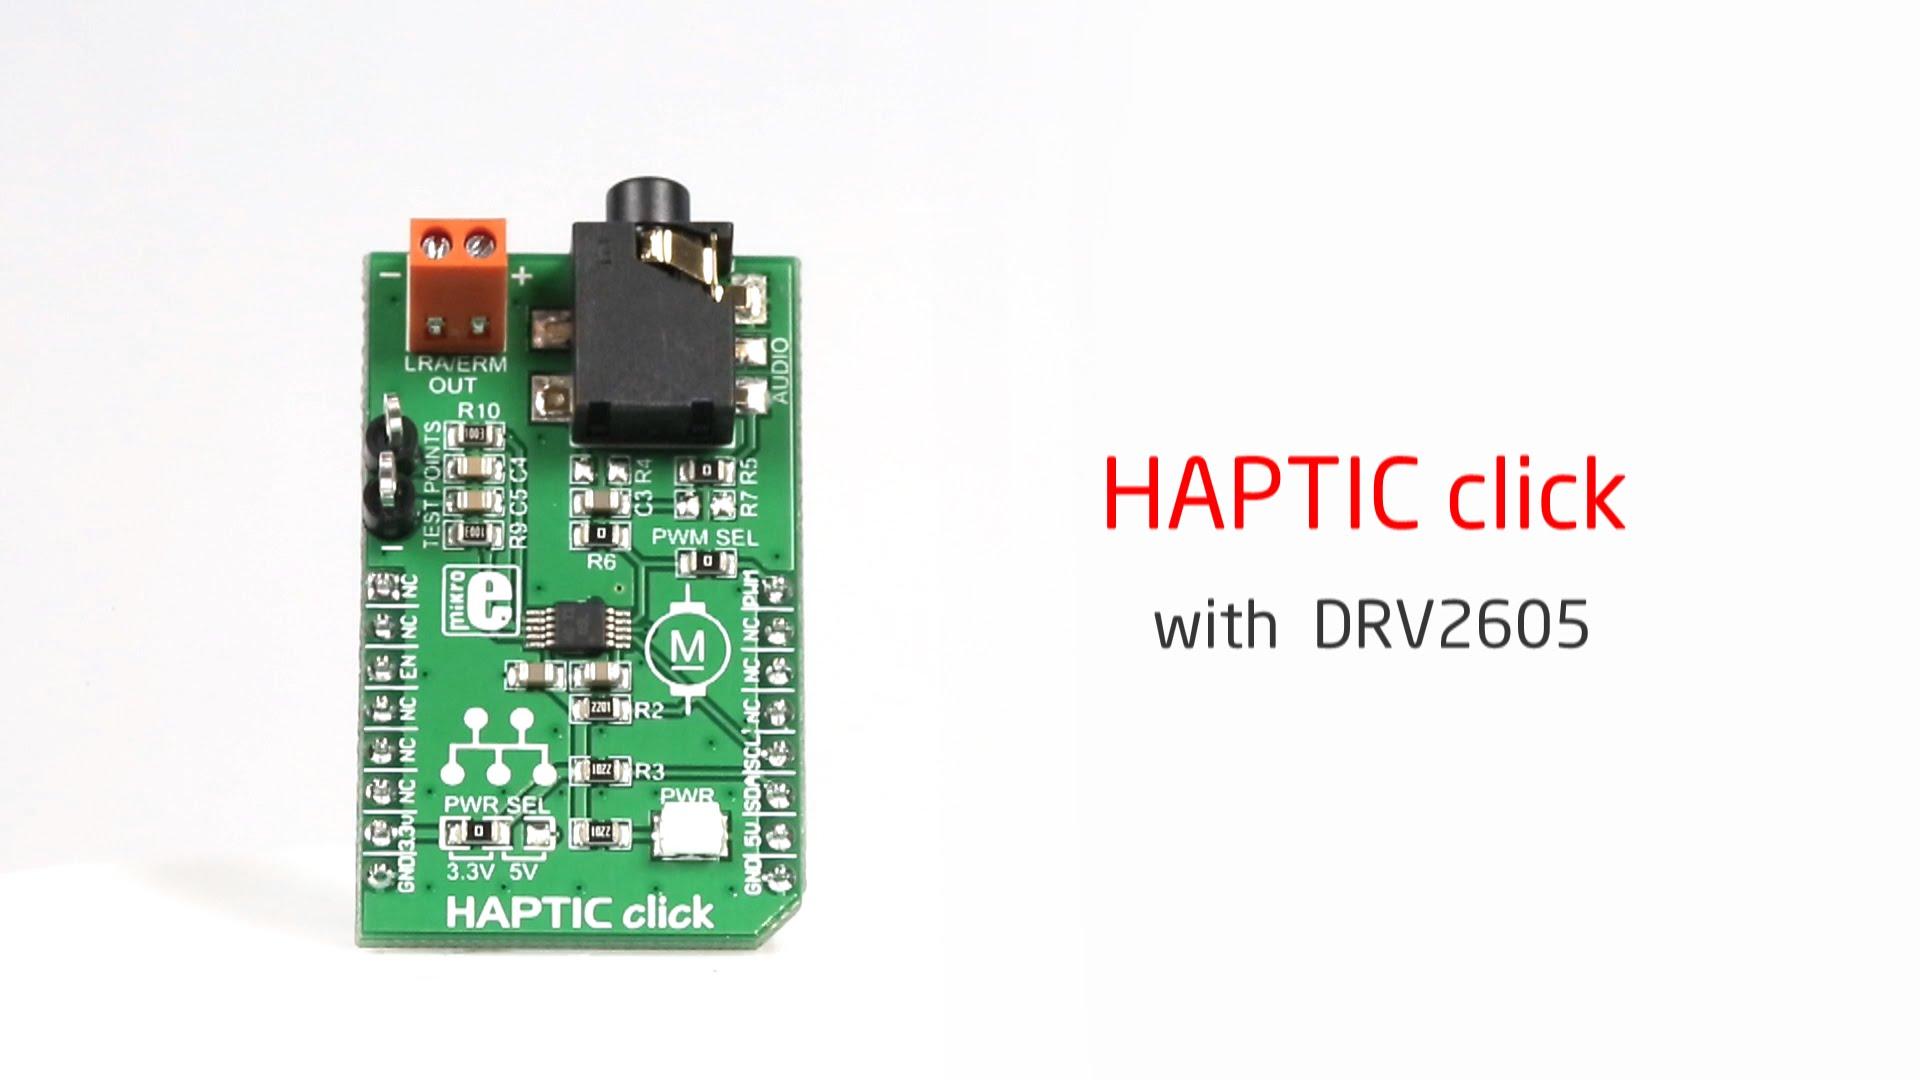 Haptic click released